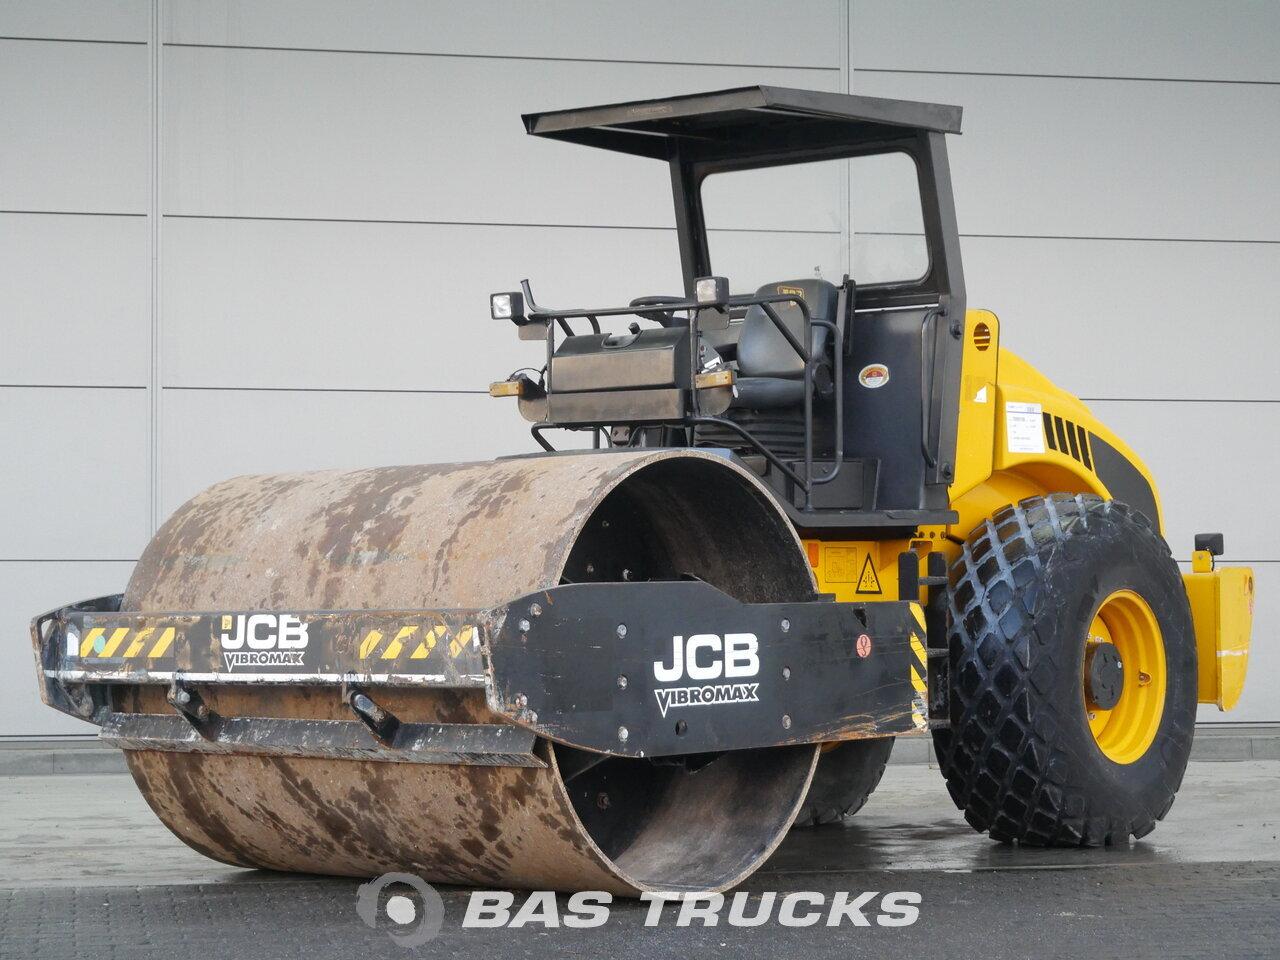 For sale at BAS Trucks: JCB VM115J3 Vibromax Roller 01/2011